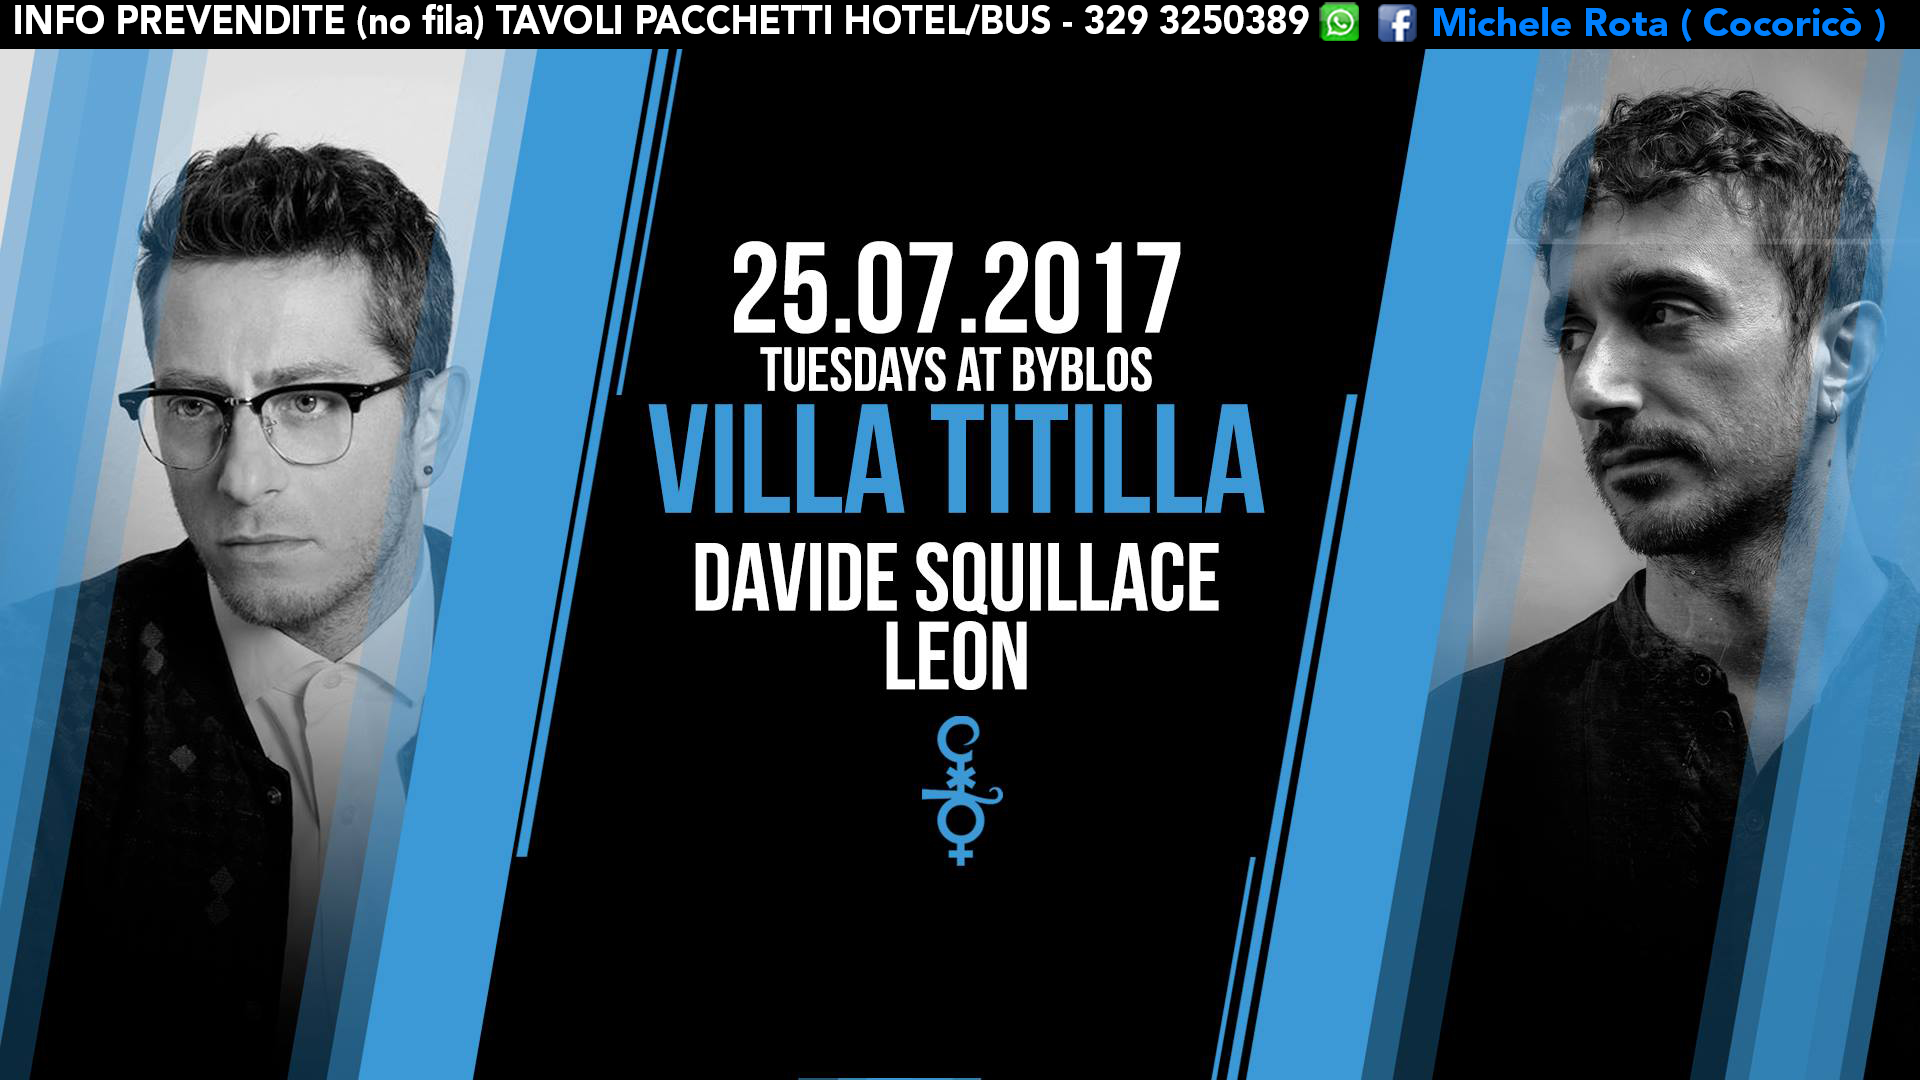 BYBLOS VILLA TITILLA DAVIDE SQUILLACE LEON 25 07 2017